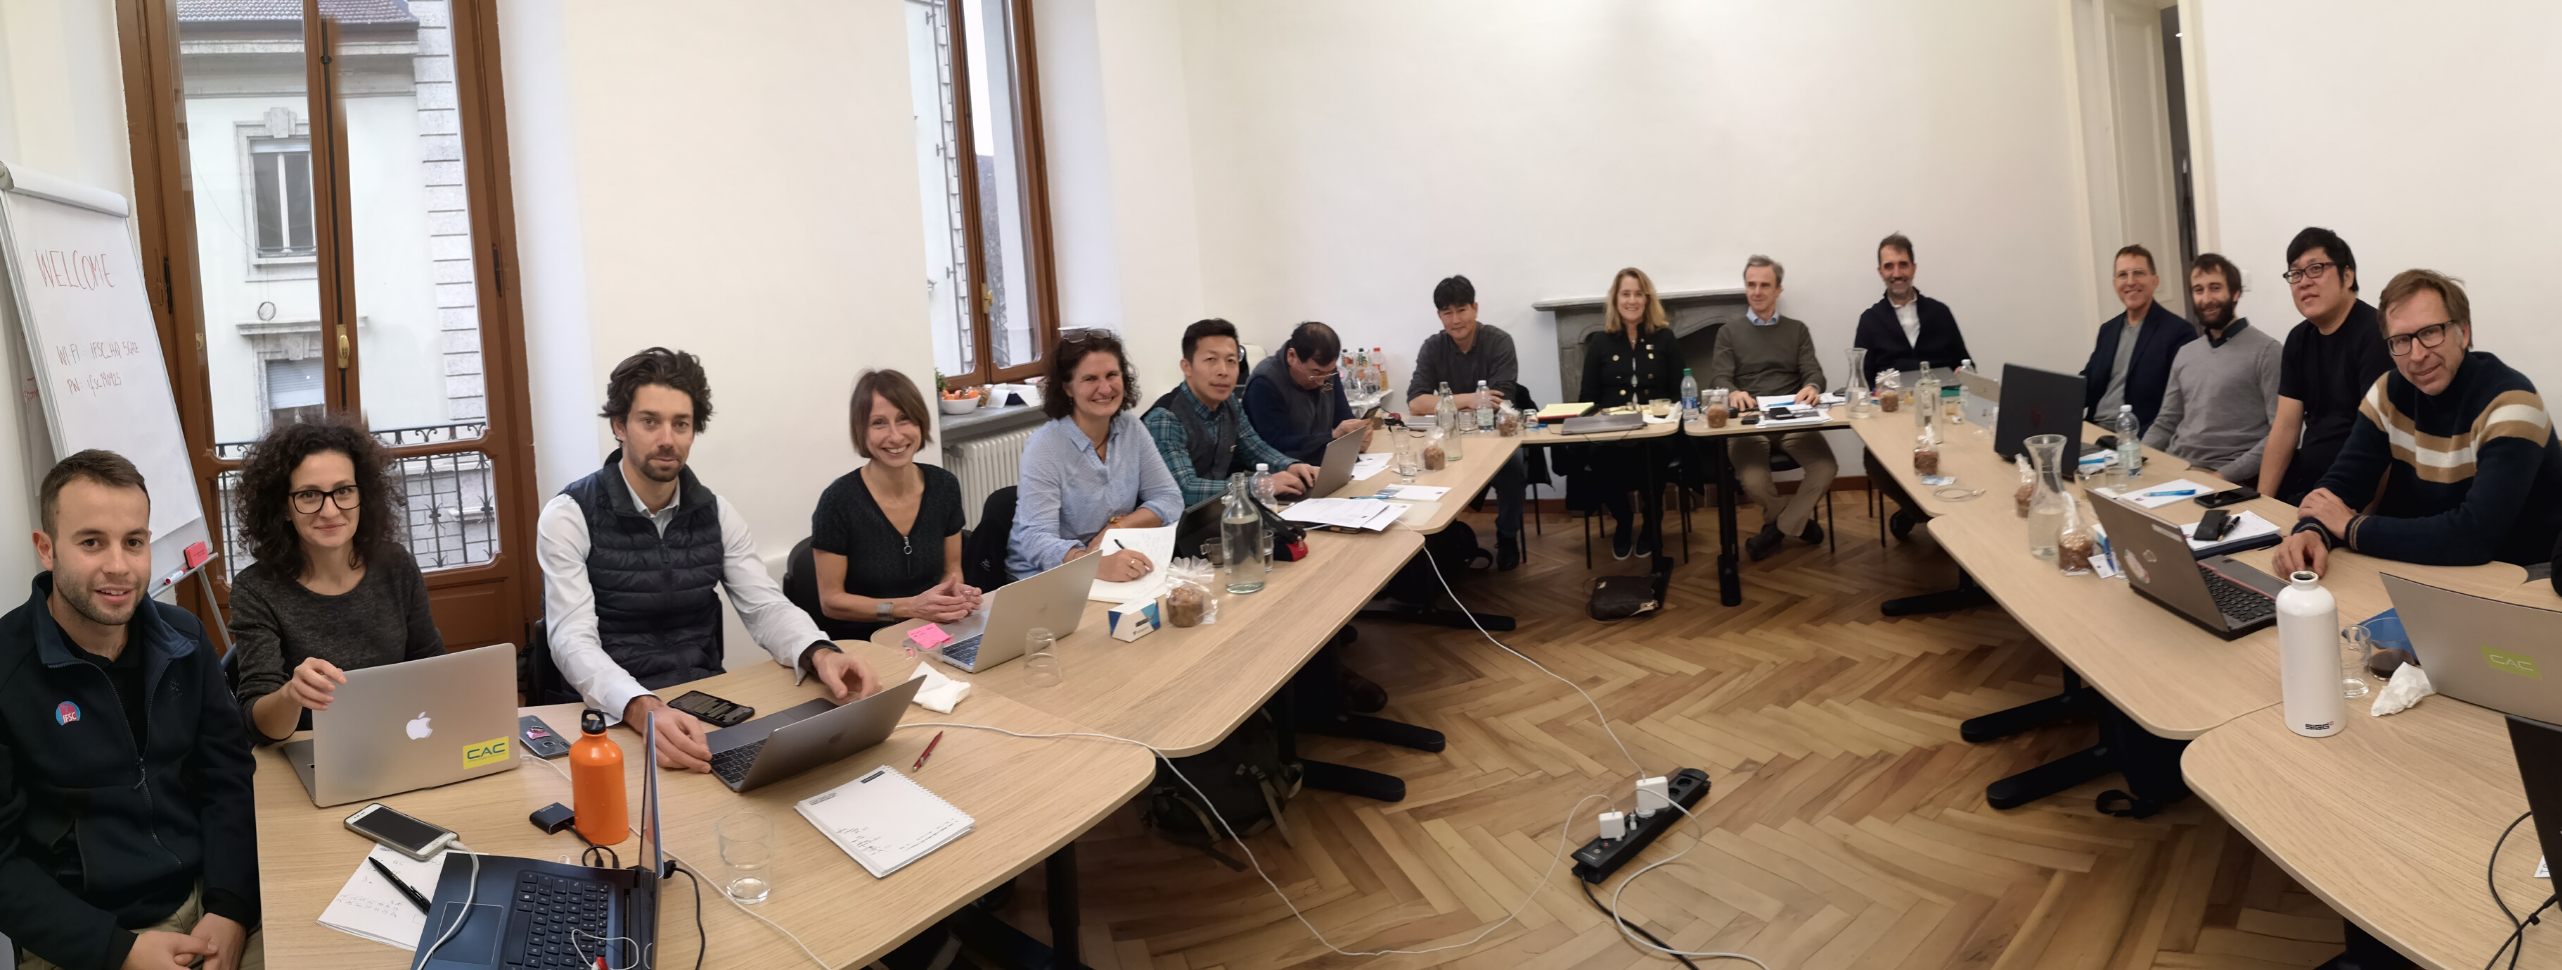 IFSC Executive Board Meeting December 2019